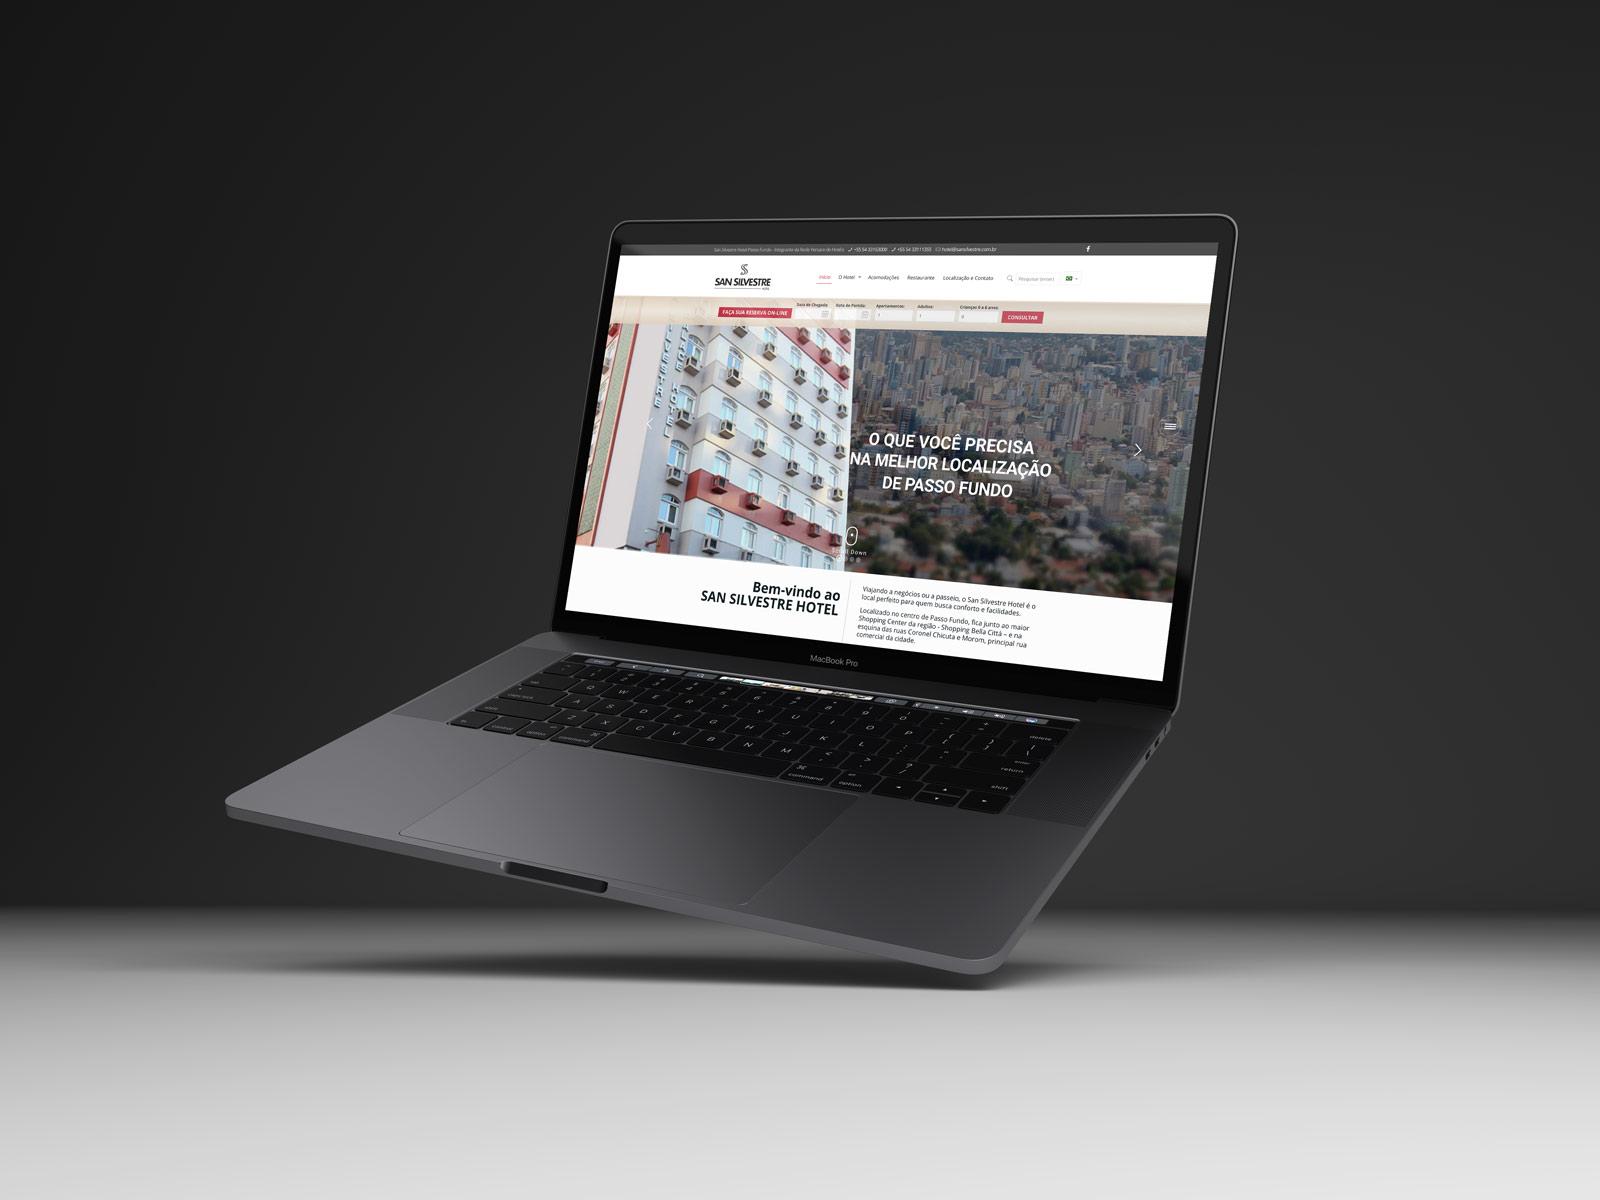 sansilvestrehotel-macbook